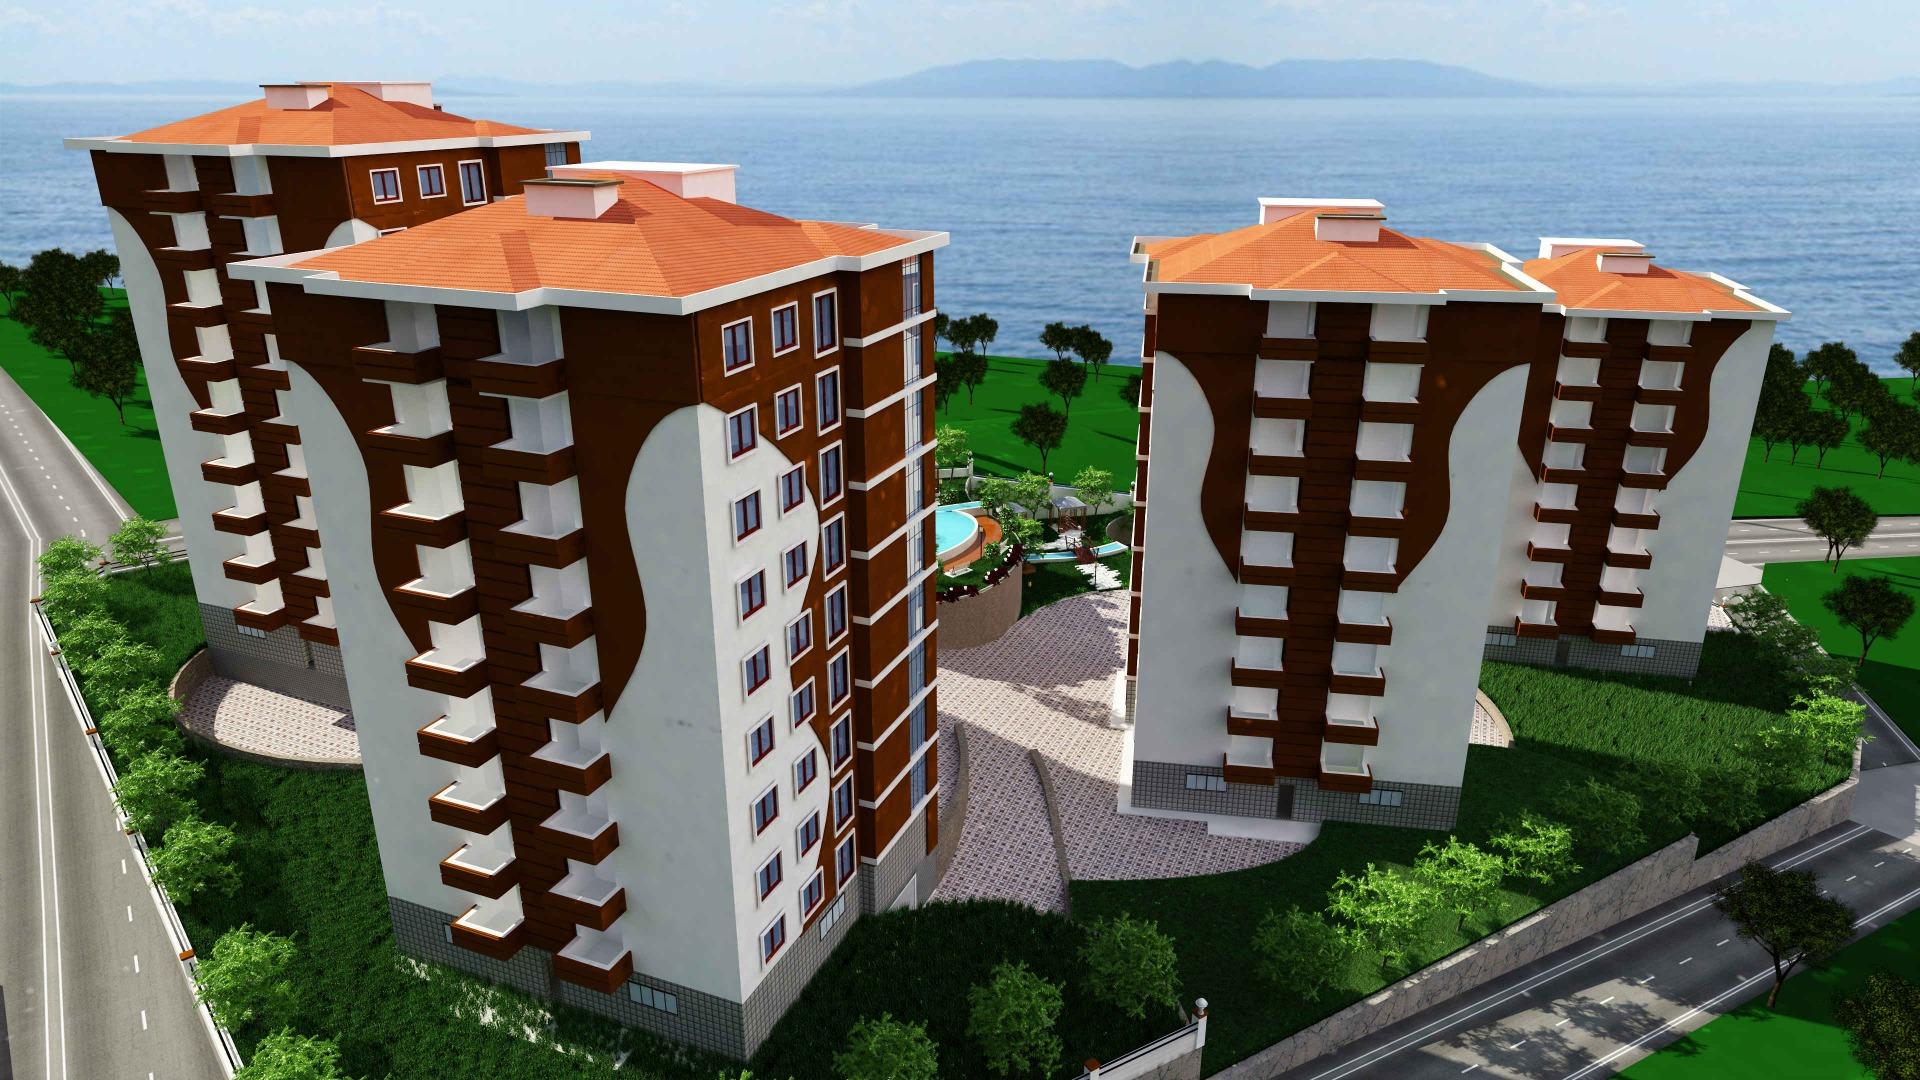 Çukurçayır (Trabzon 1461 Dört Mevsim)